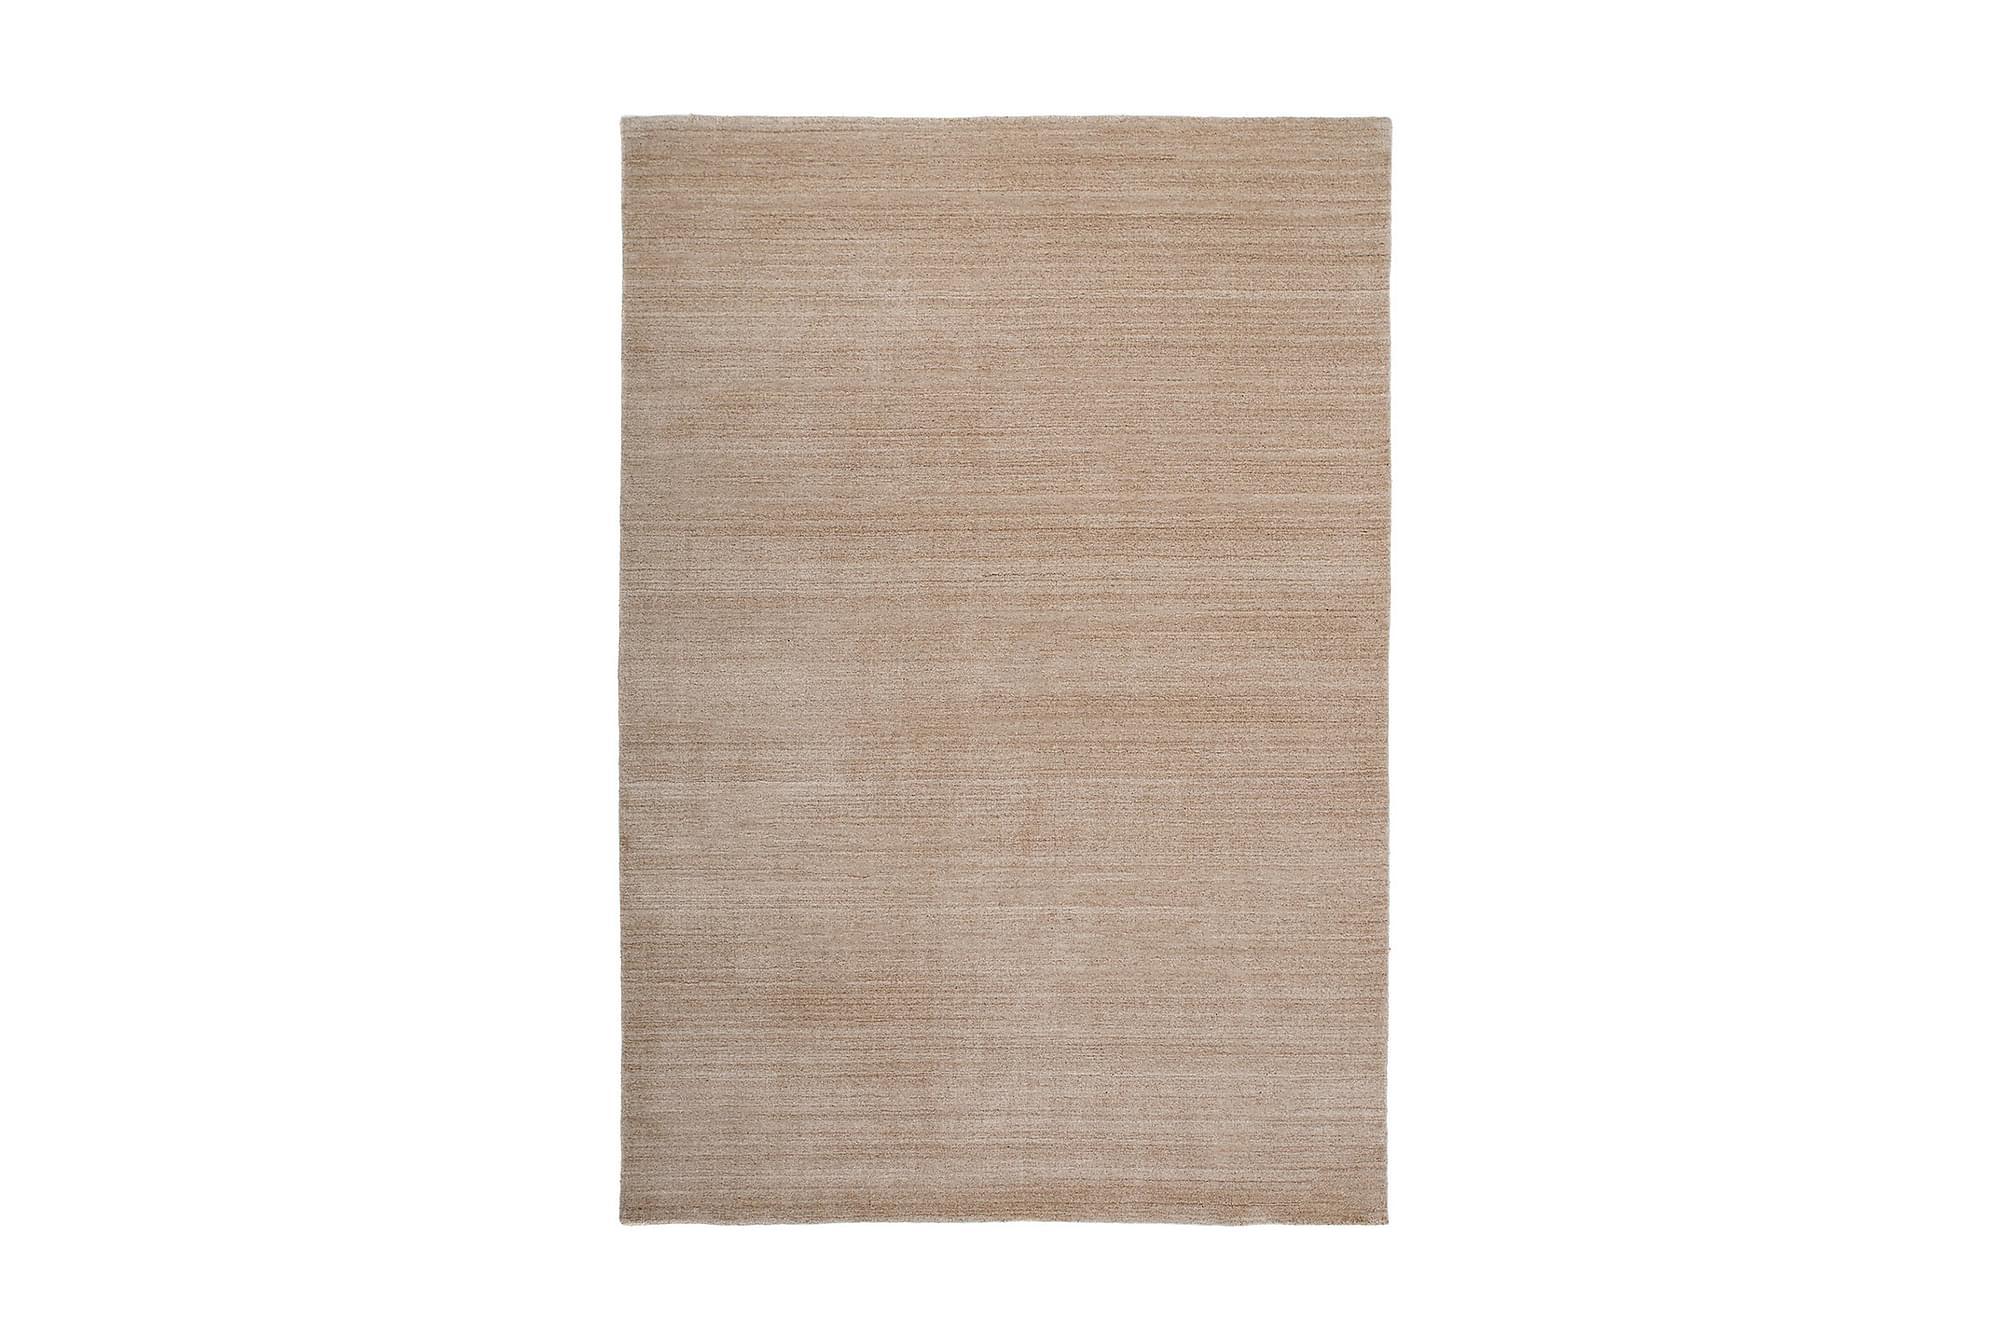 CLEO Viskosmatta 135x190 Sand, Viskosmattor